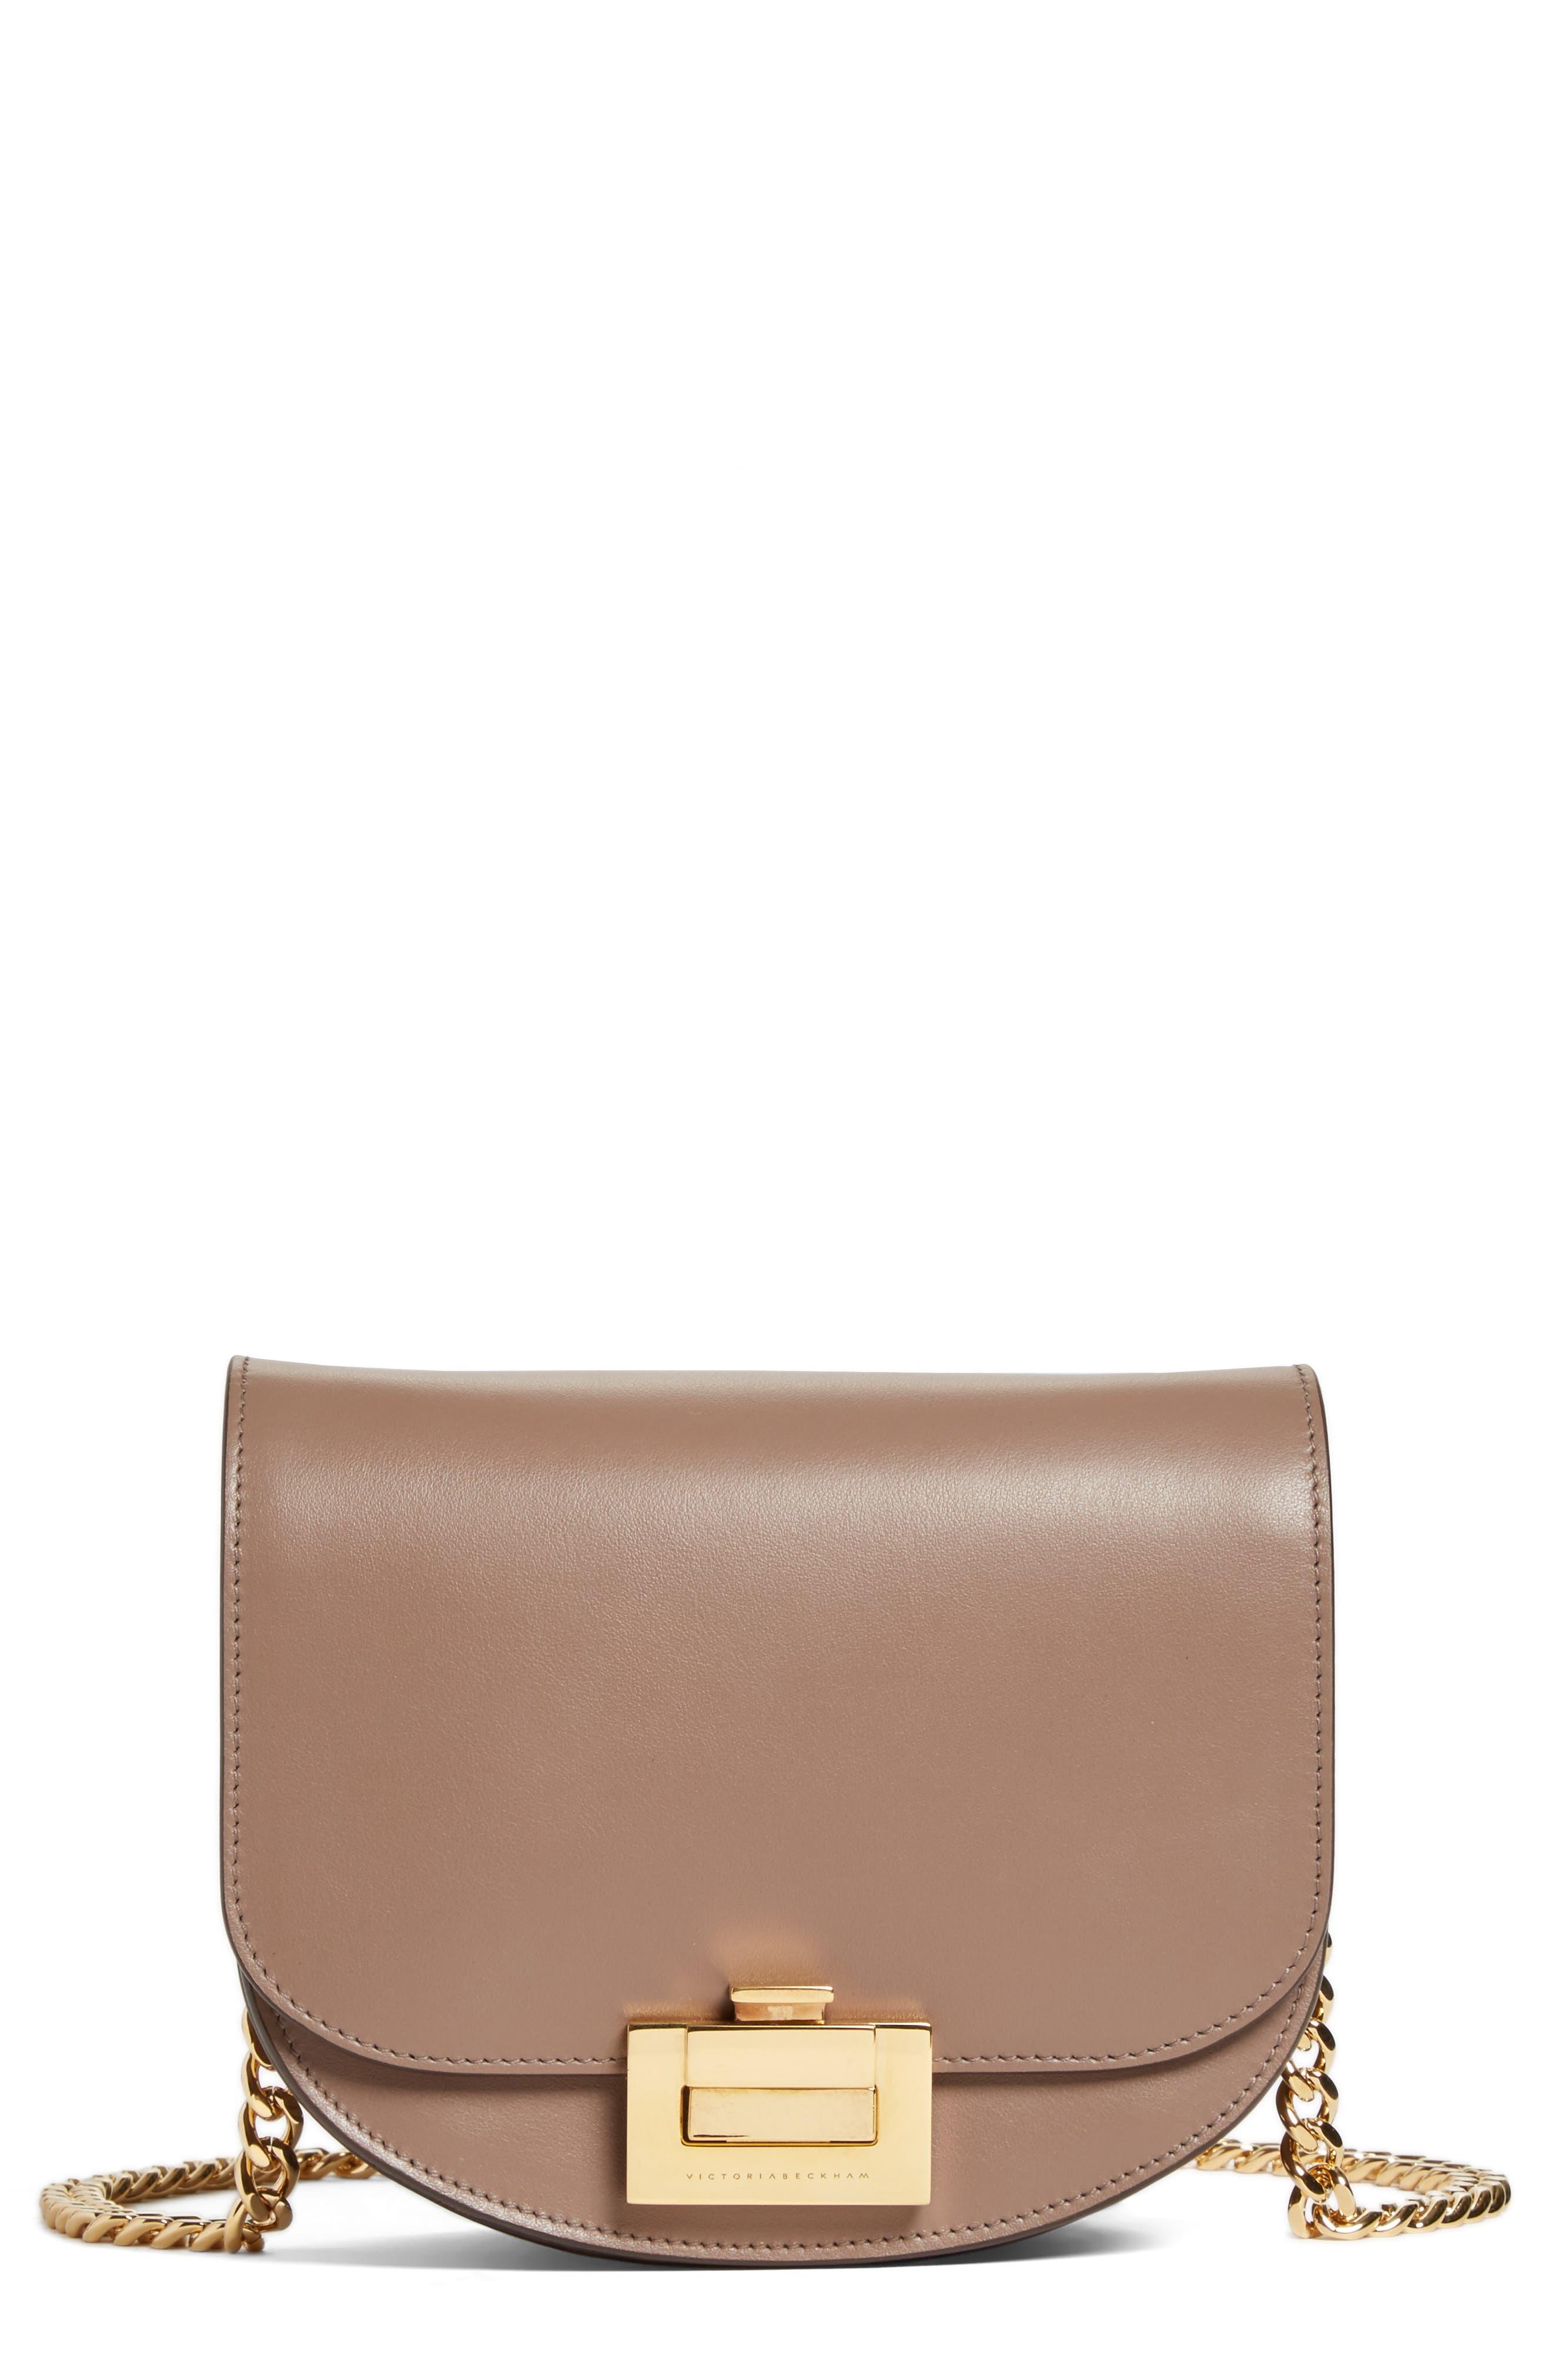 Victoria Beckham Medium Box Leather Shoulder Bag